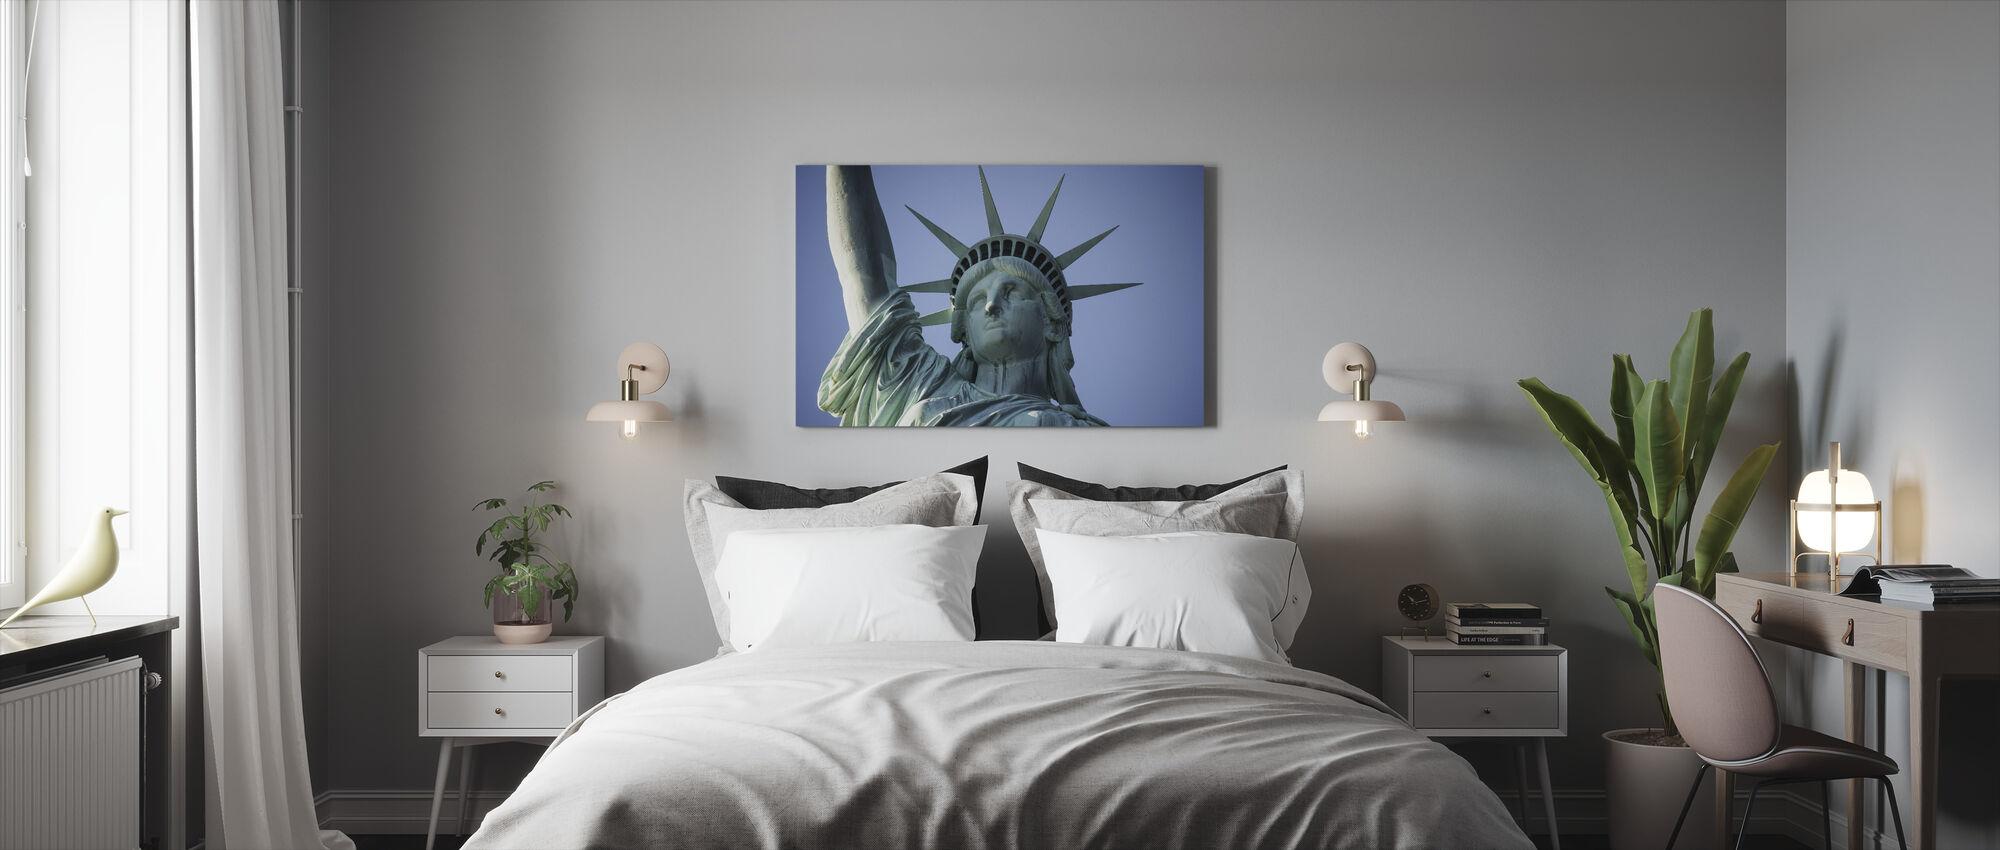 Statue of Liberty - Canvas print - Bedroom